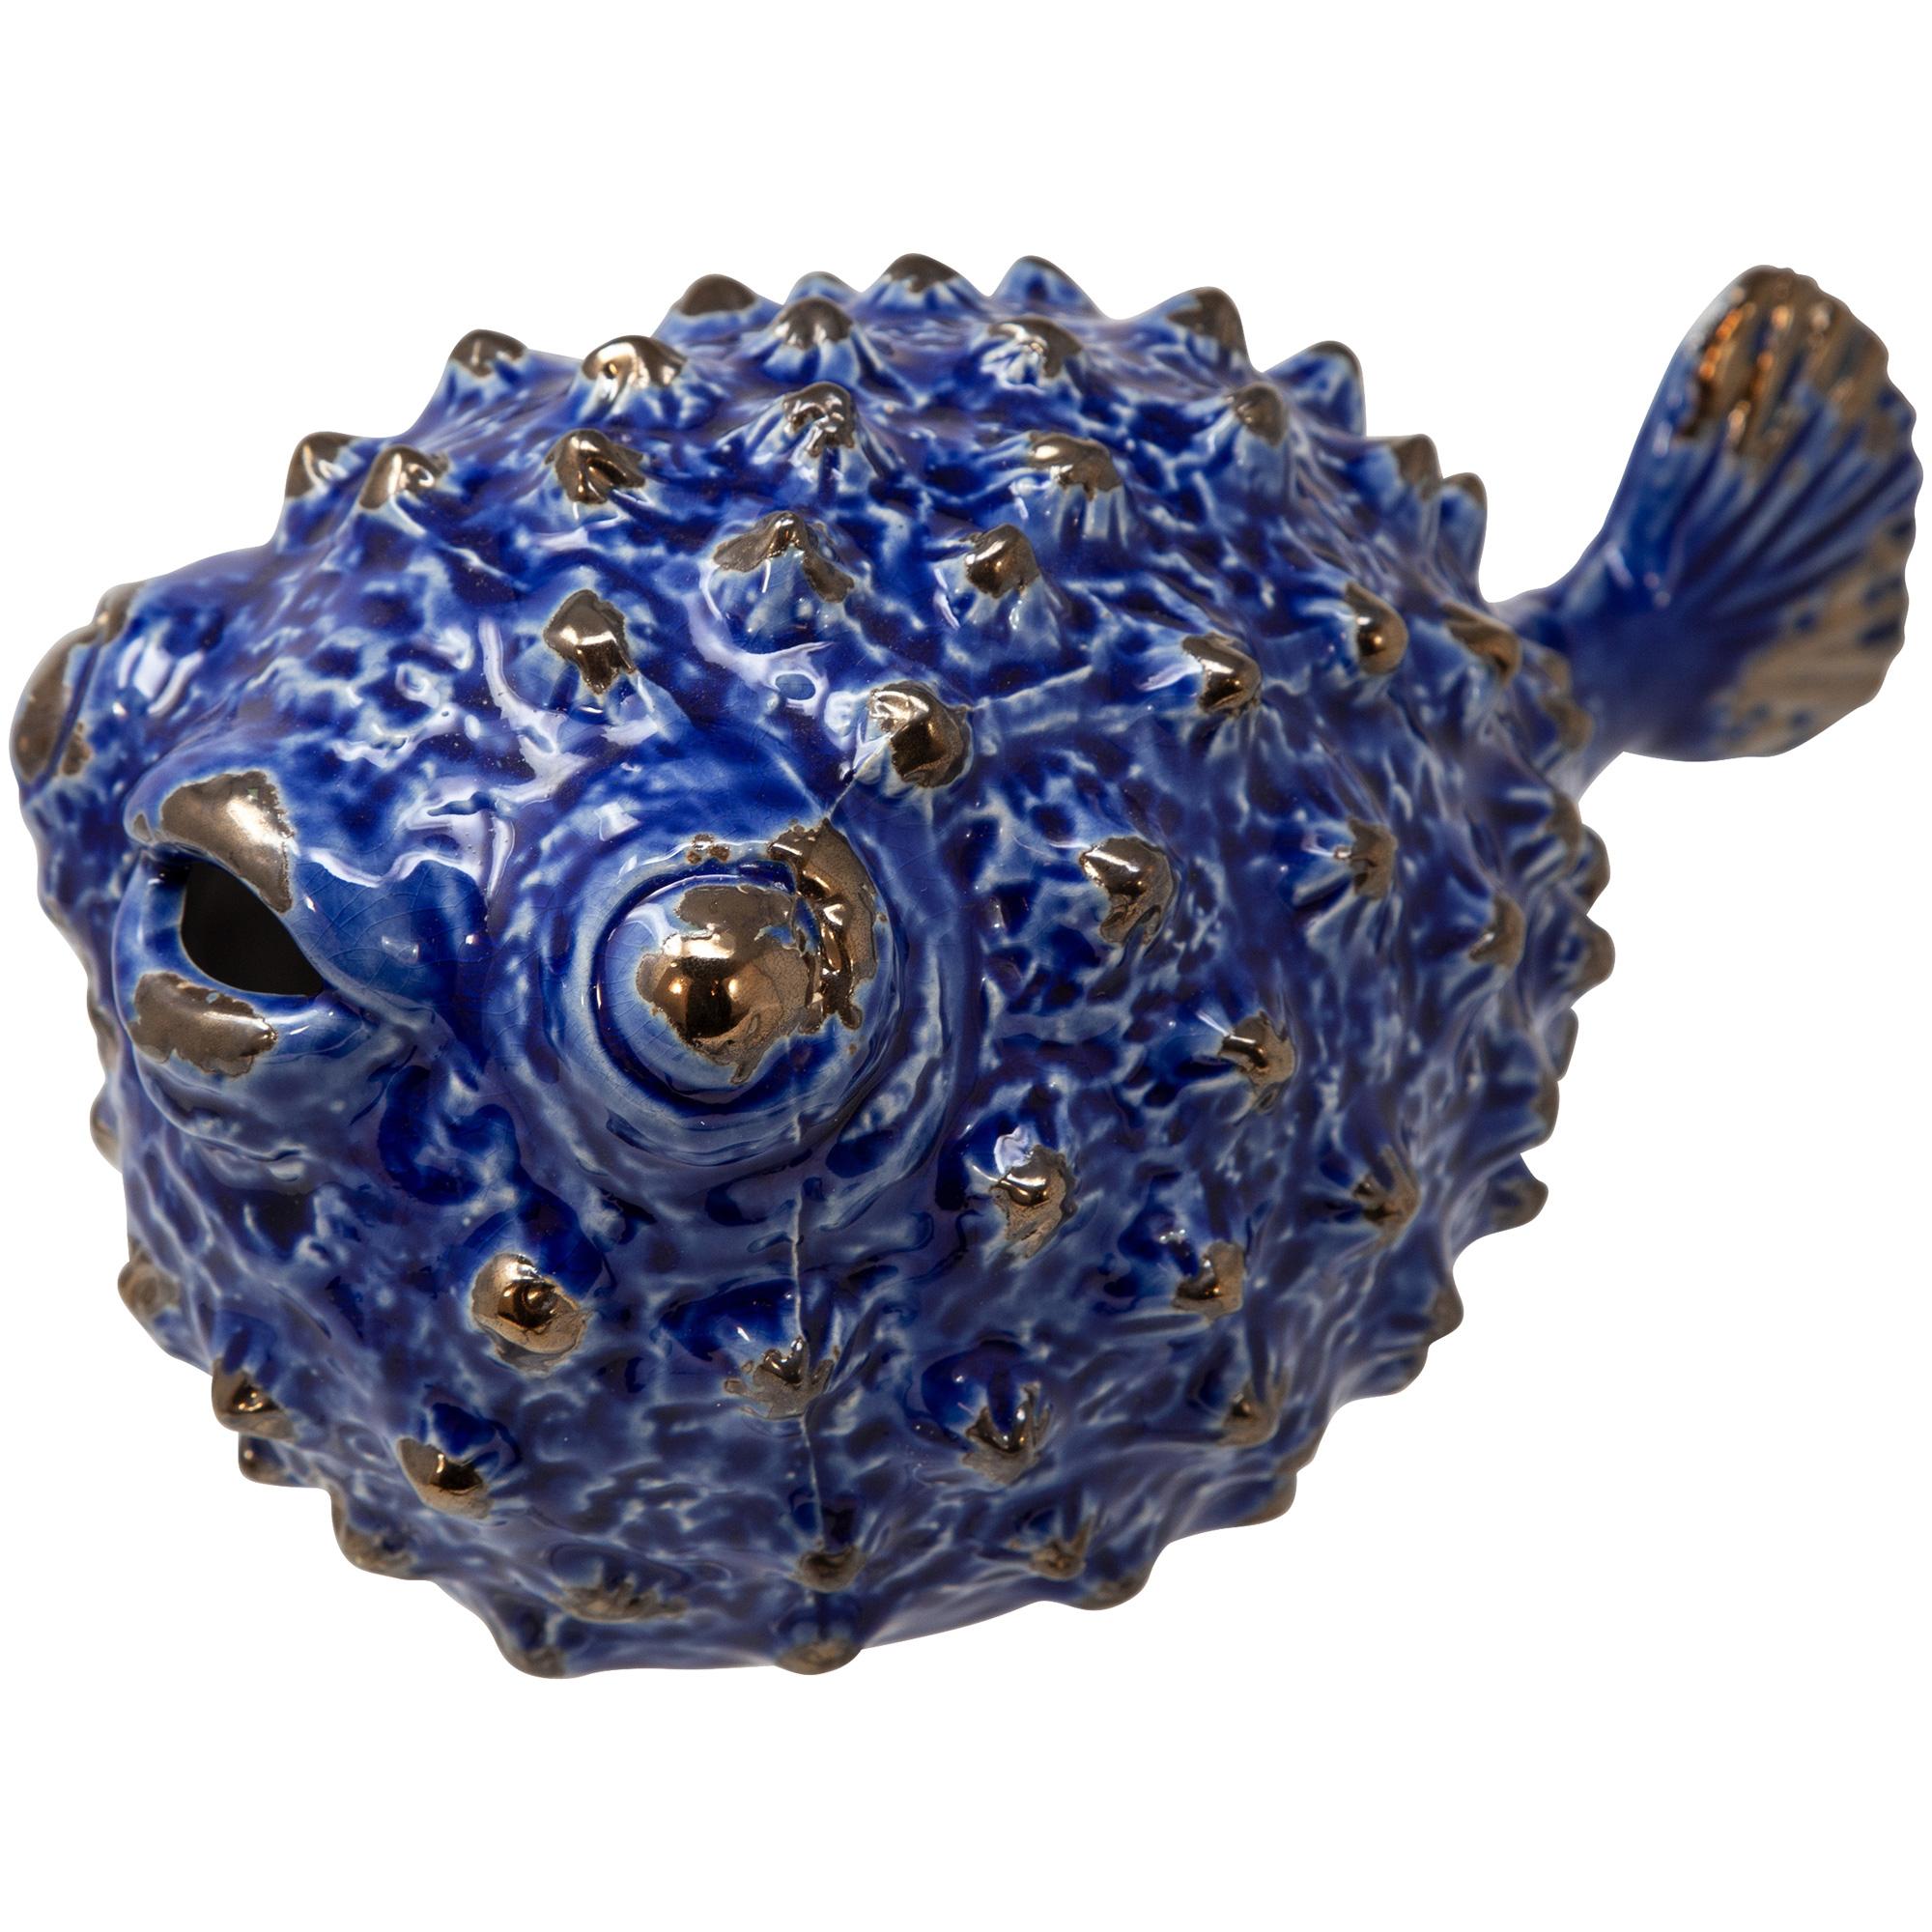 """Sagebrook | Collected Culture Blue Ceramic 8"""" Puffer Fish"""